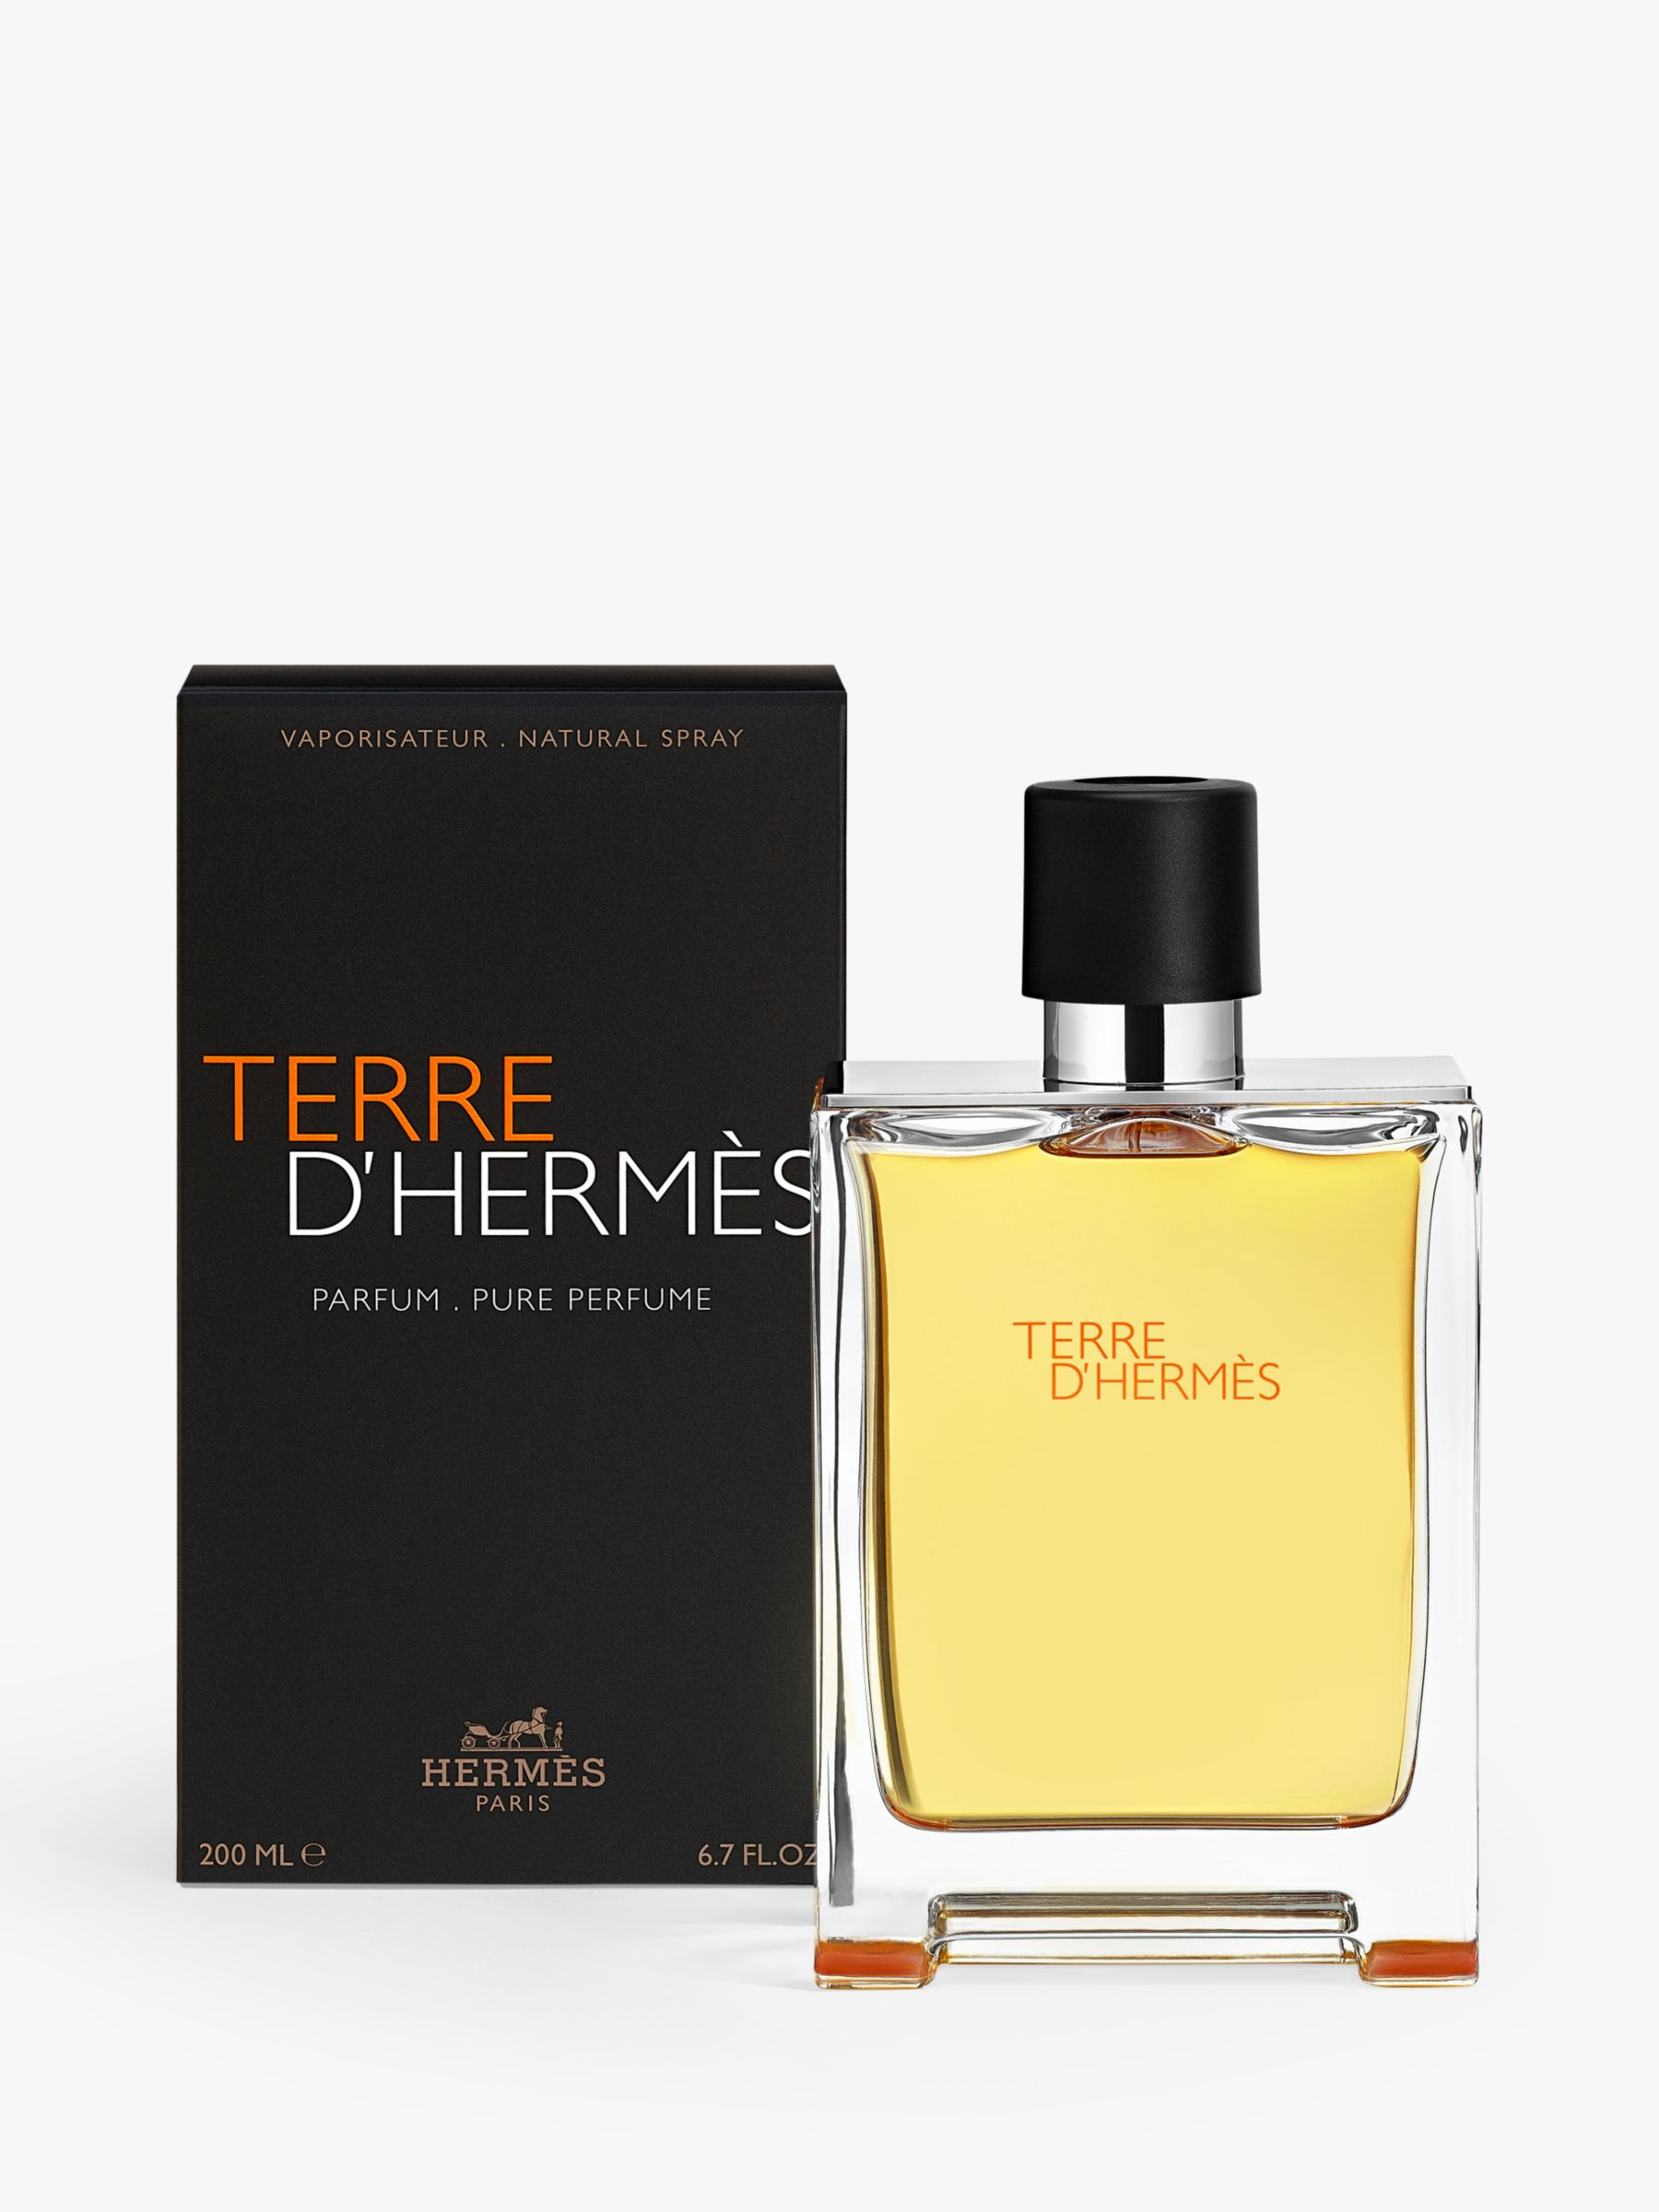 Hermes HERMÈS Terre d'Hermès Pure Perfume, 200ml